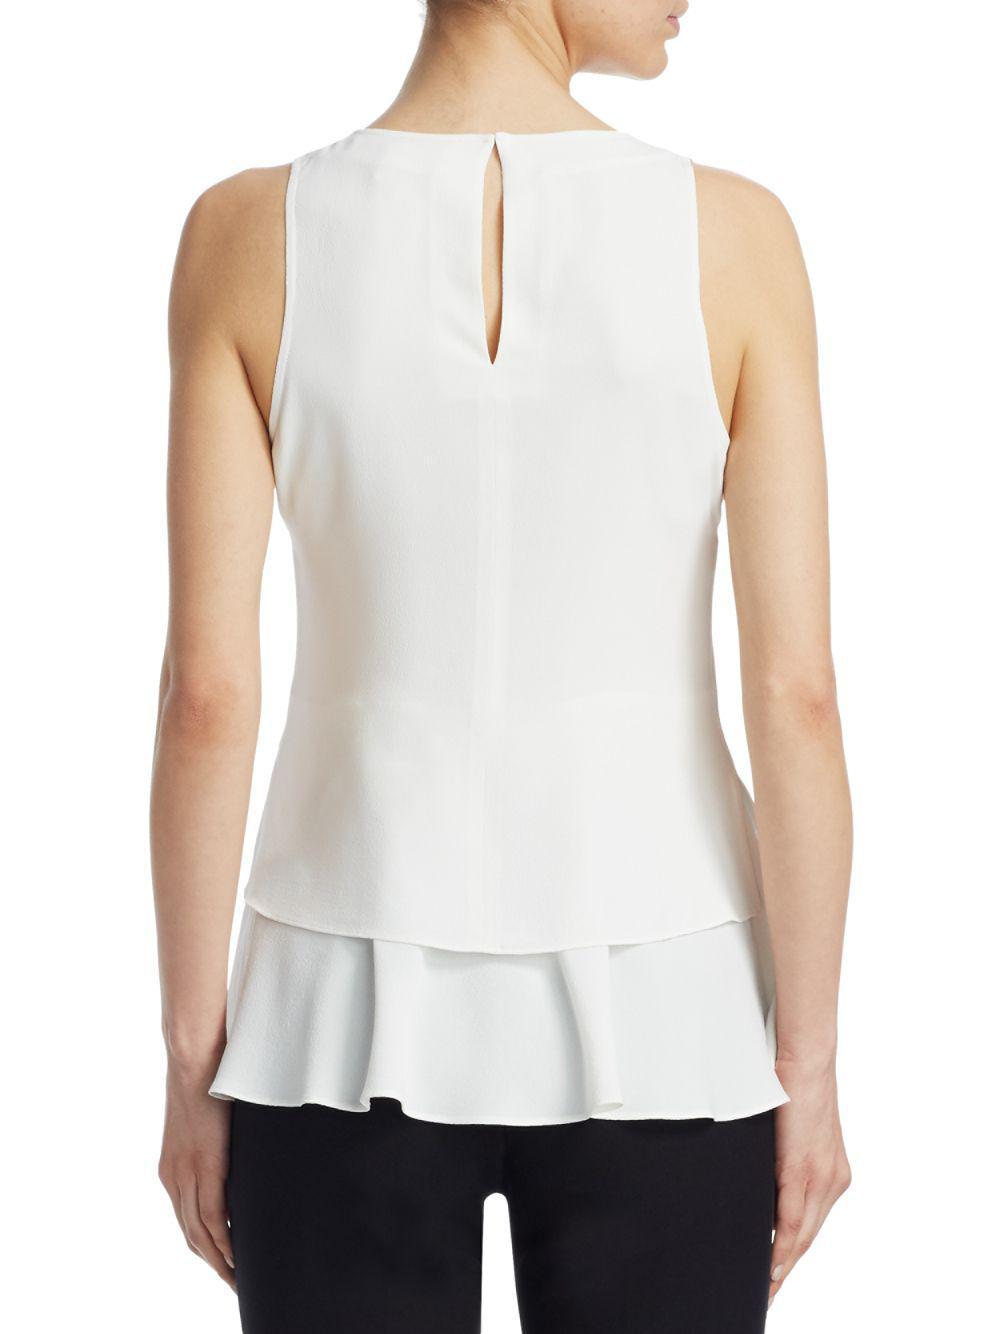 b4c34213668c4 Lyst - Derek Lam Silk Grommet Top in White